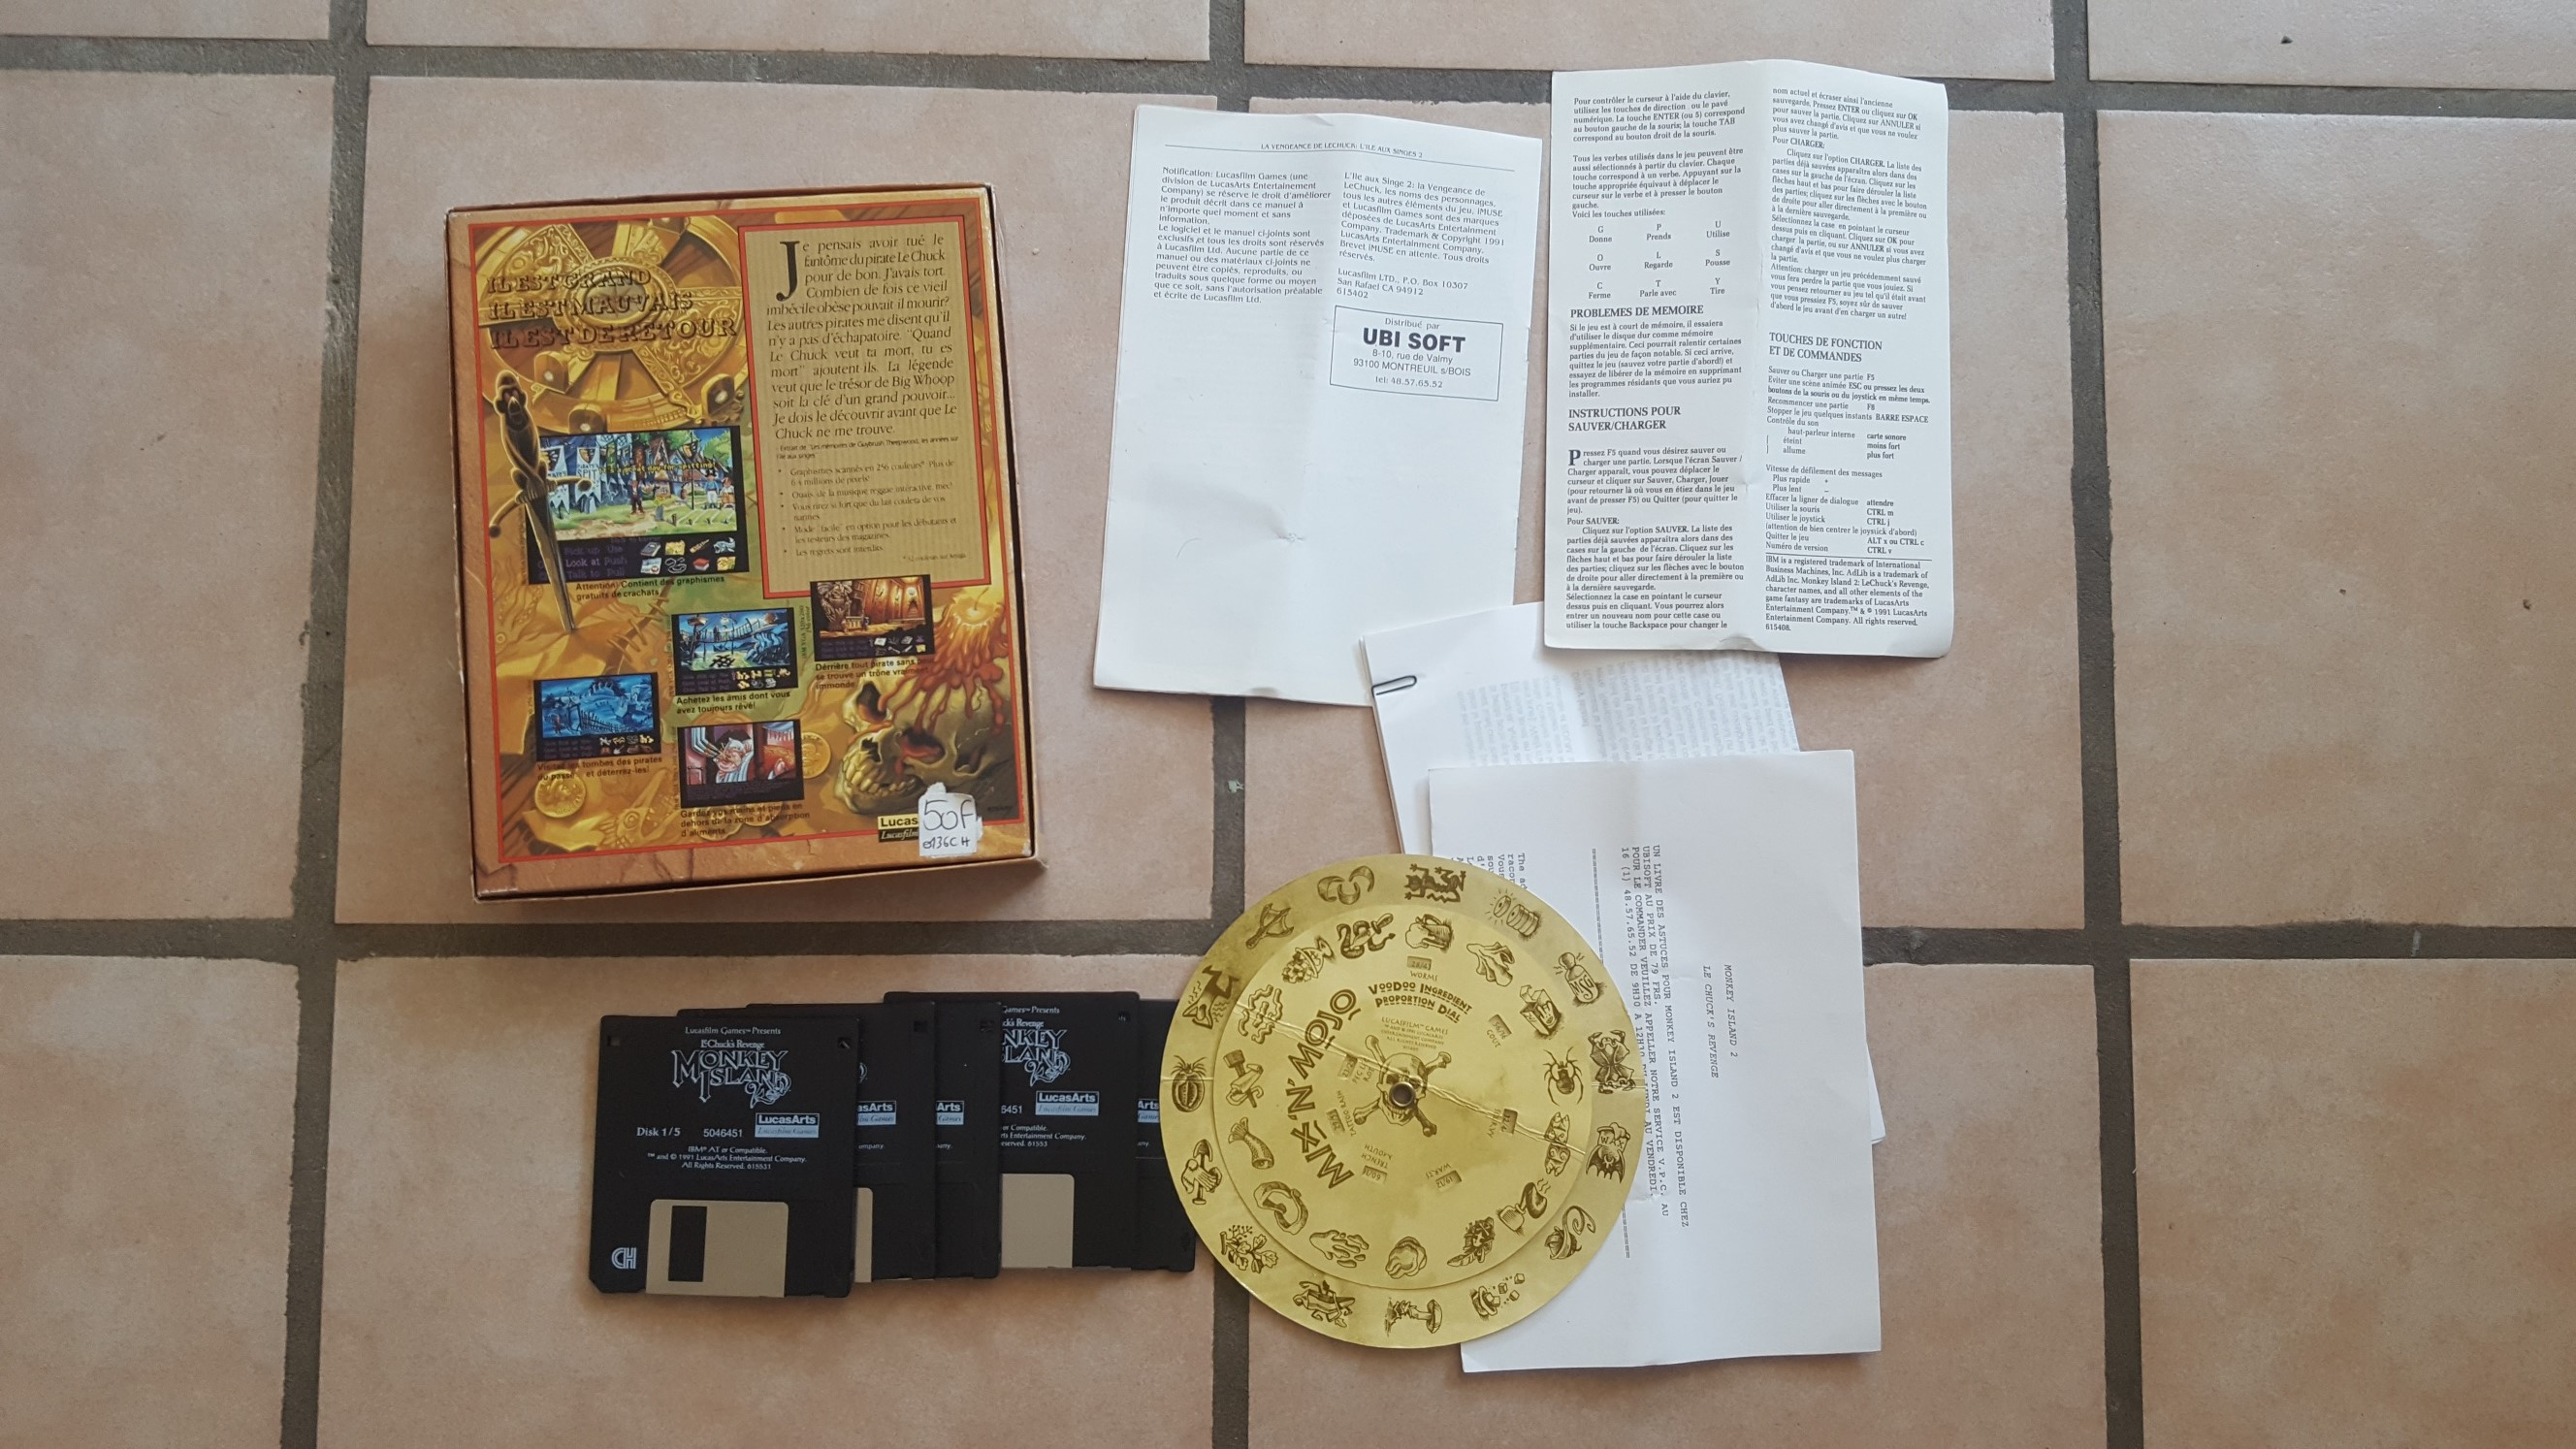 Vente ordinateurs et jeux Atari, Amiga, Amstrad et PC MAJ 20/01 - Page 6 V0DY1